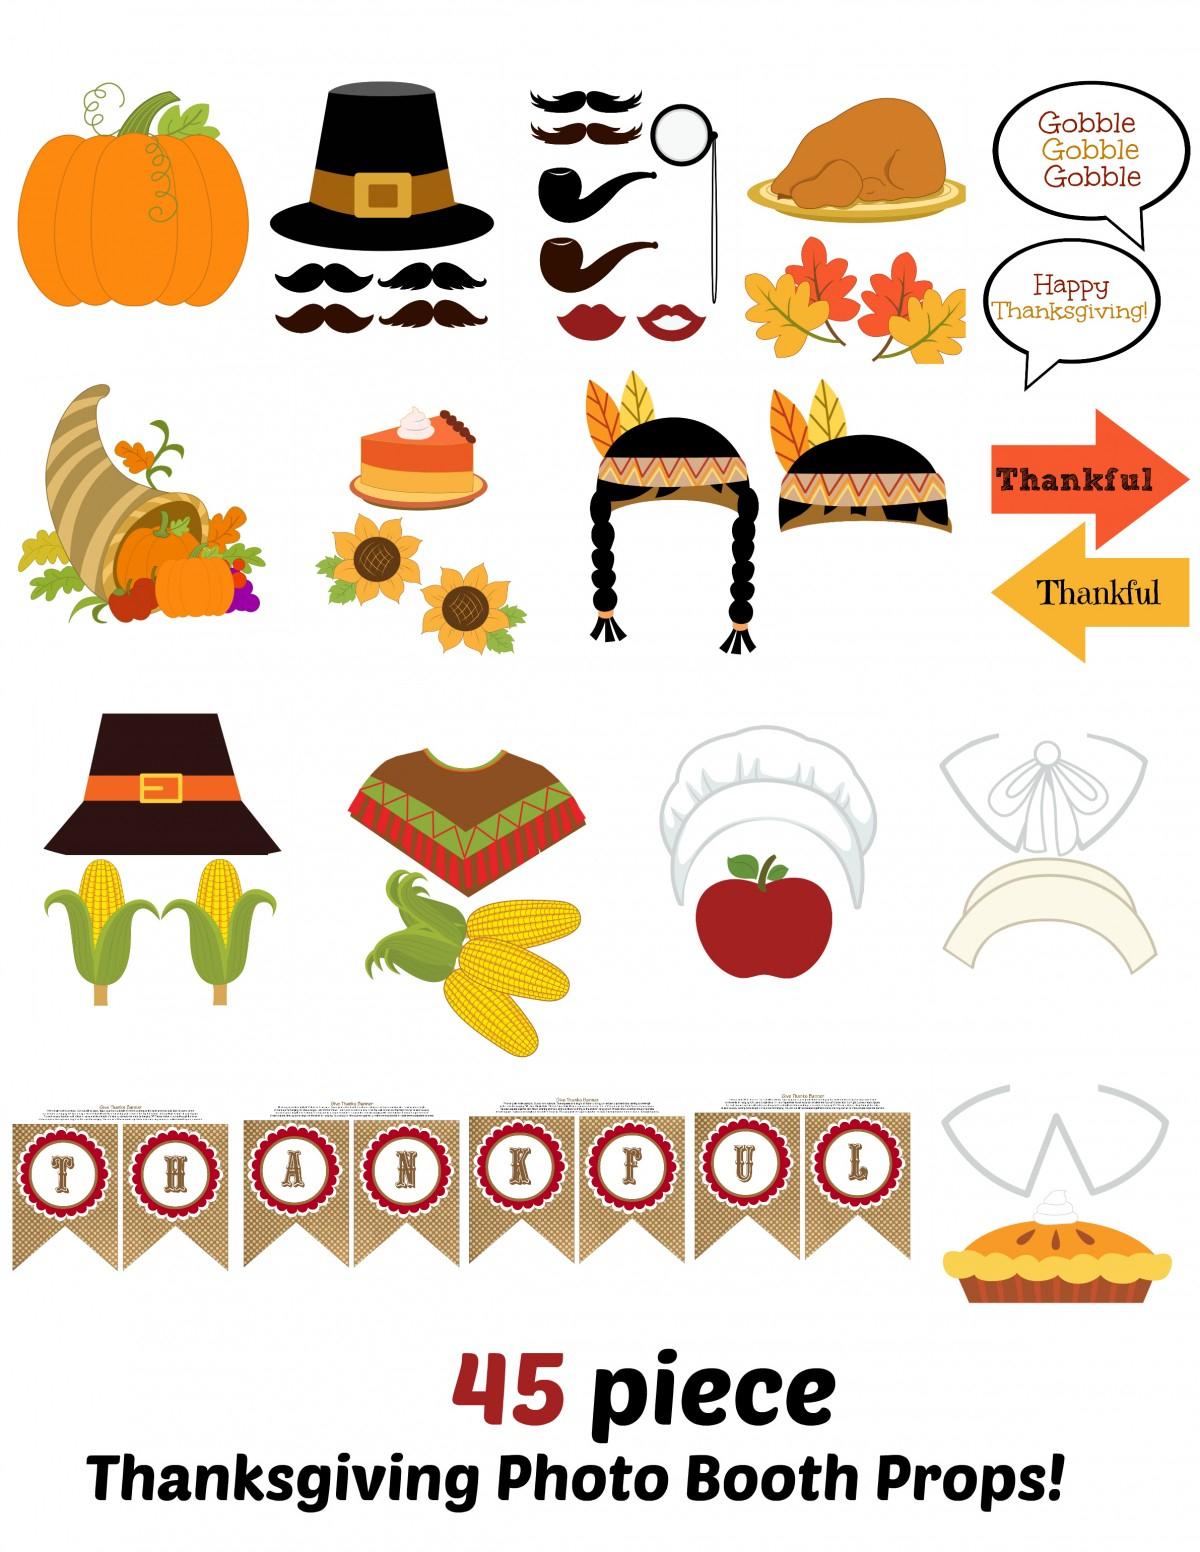 Thanksgiving Photo Booth Free Printables - Free Printable Thanksgiving Photo Props